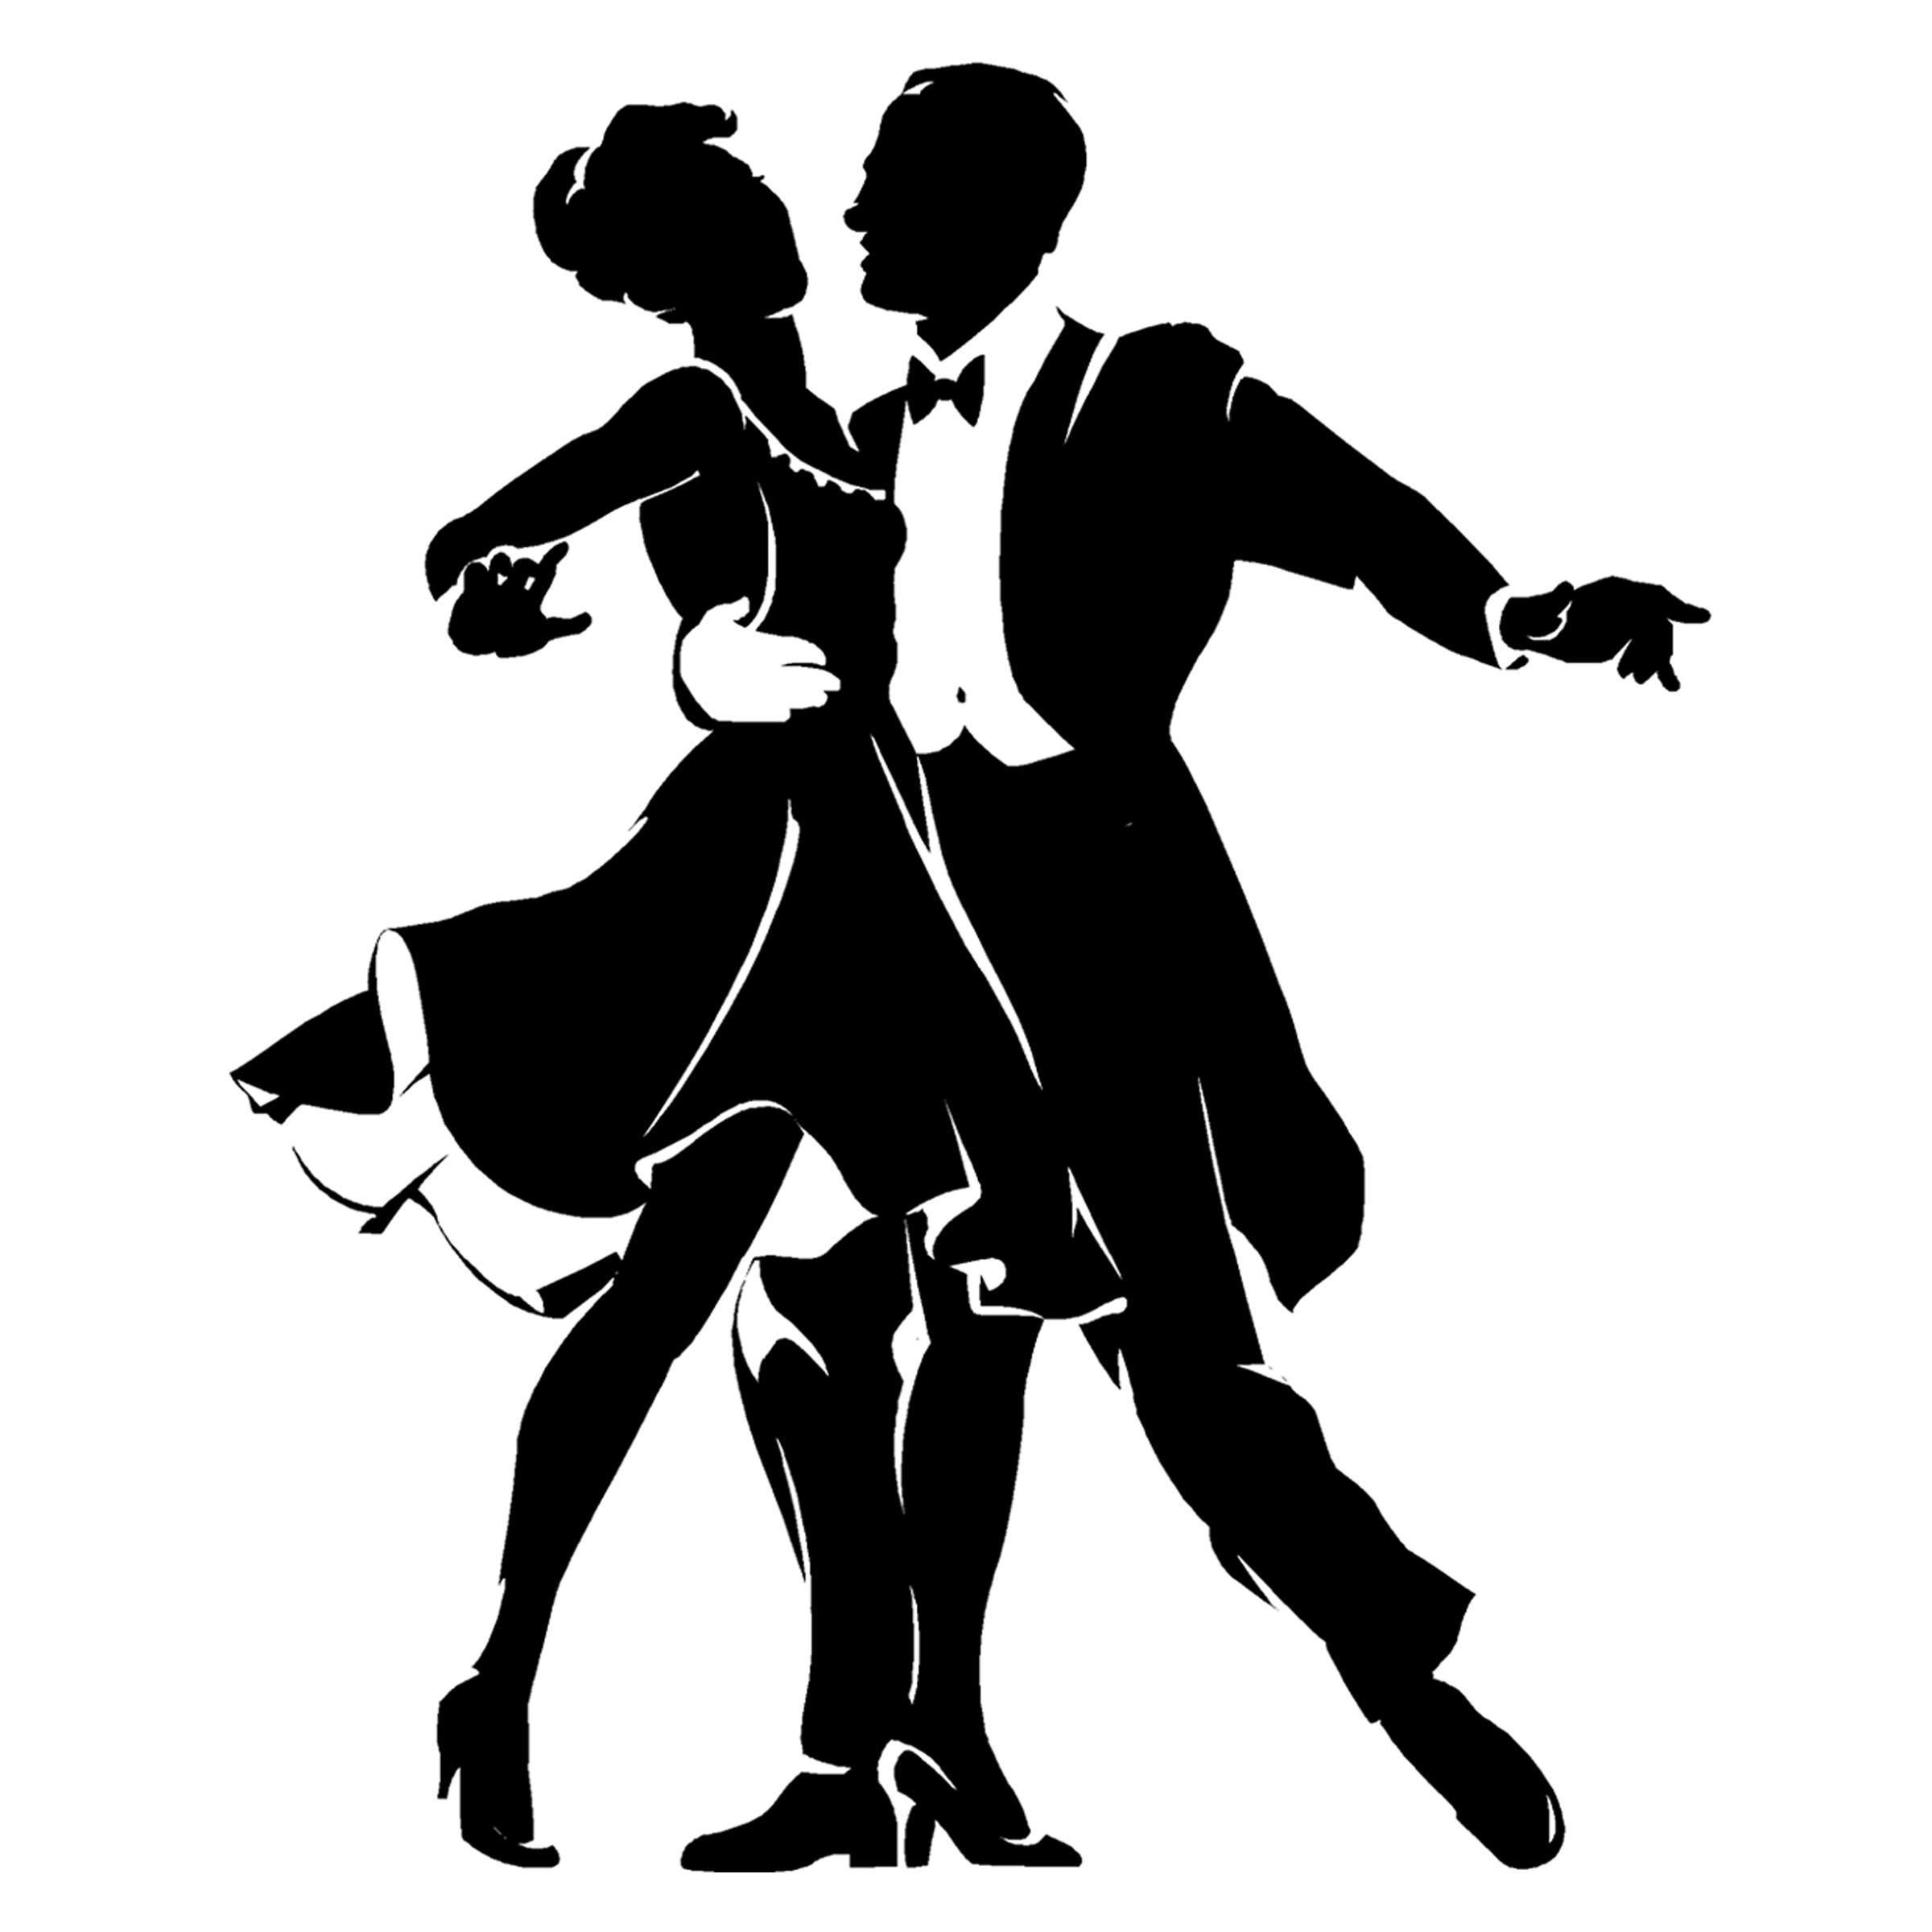 HD Quality Wallpaper | Collection: Sports, 2400x2400 Ballroom Dancing